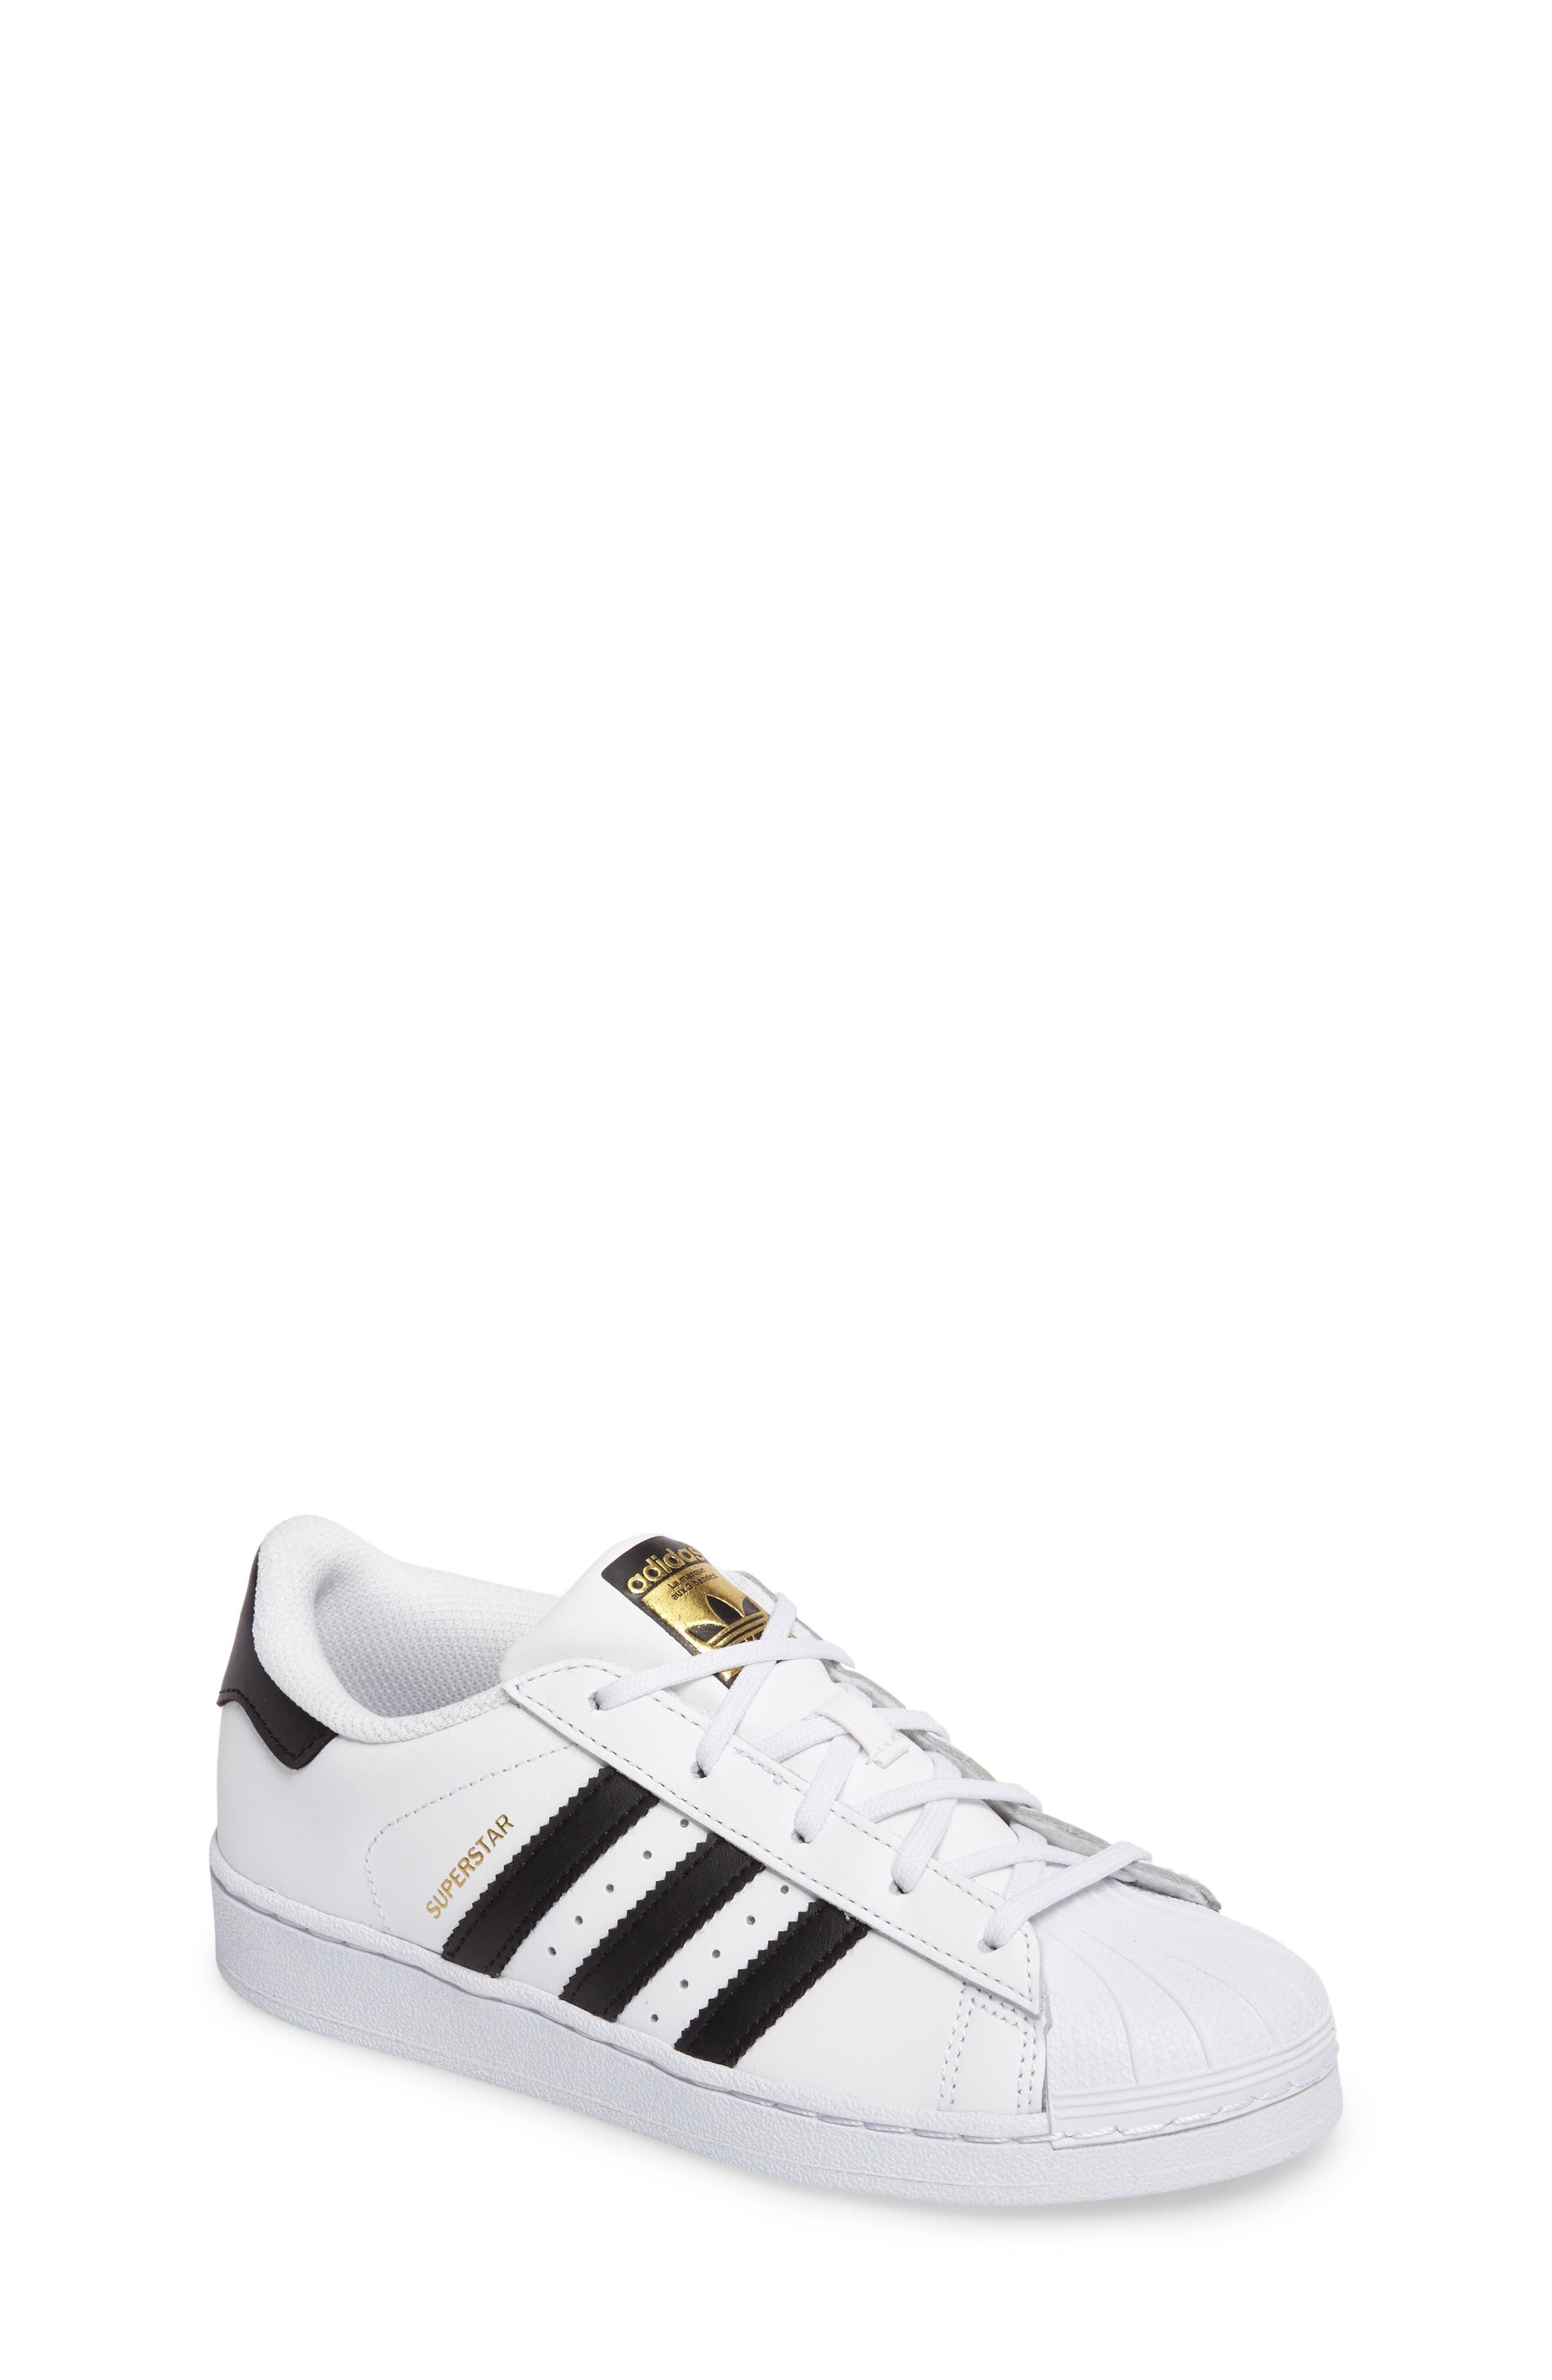 'Superstar Foundation' Sneaker